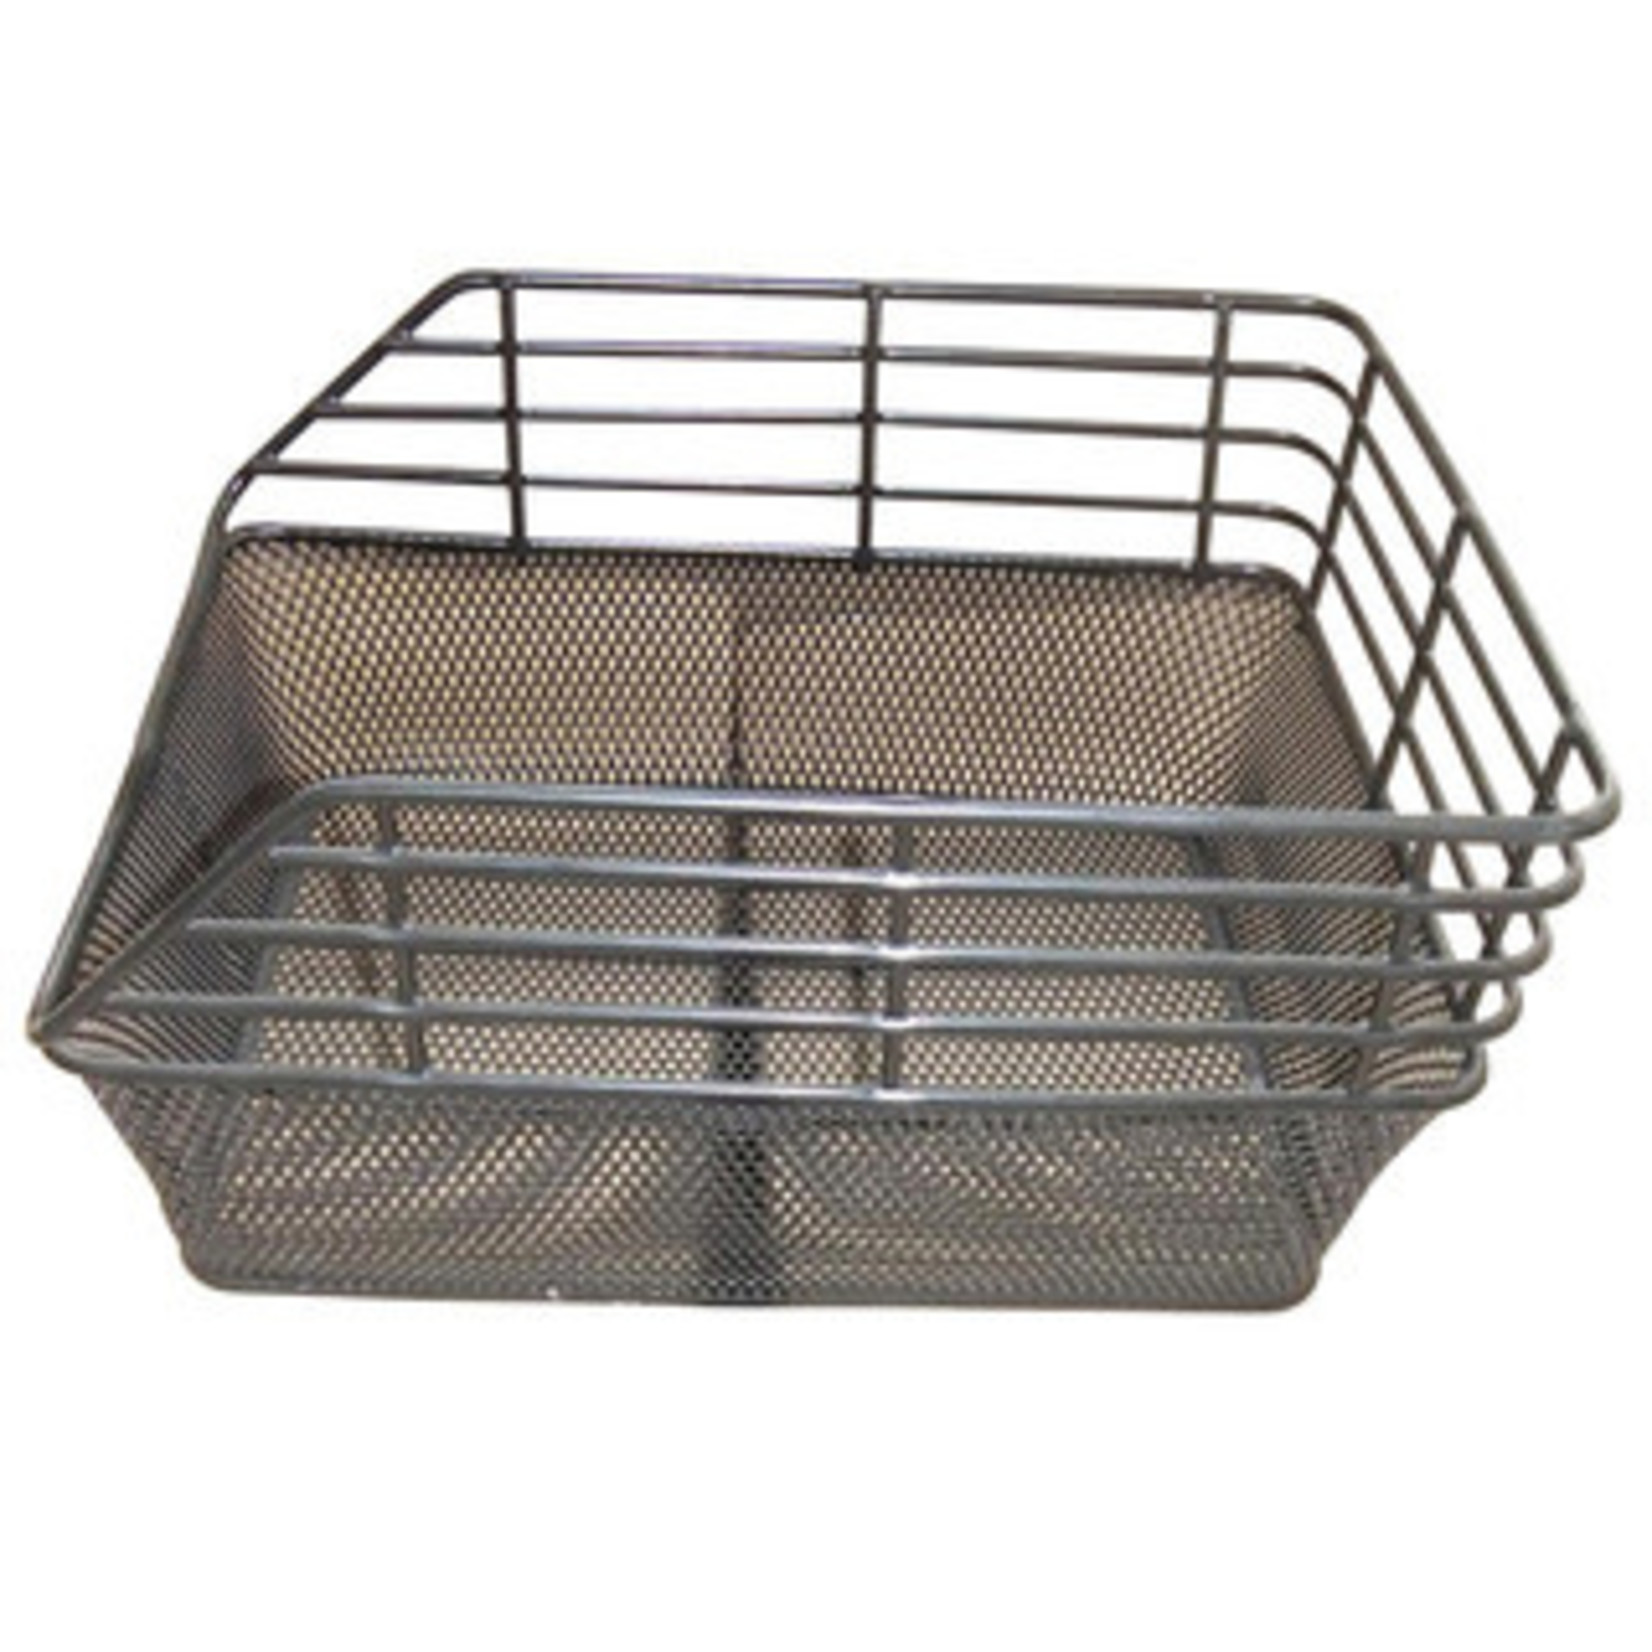 Evo Evo E-Cargo Dual Mesh Rear Basket, Black